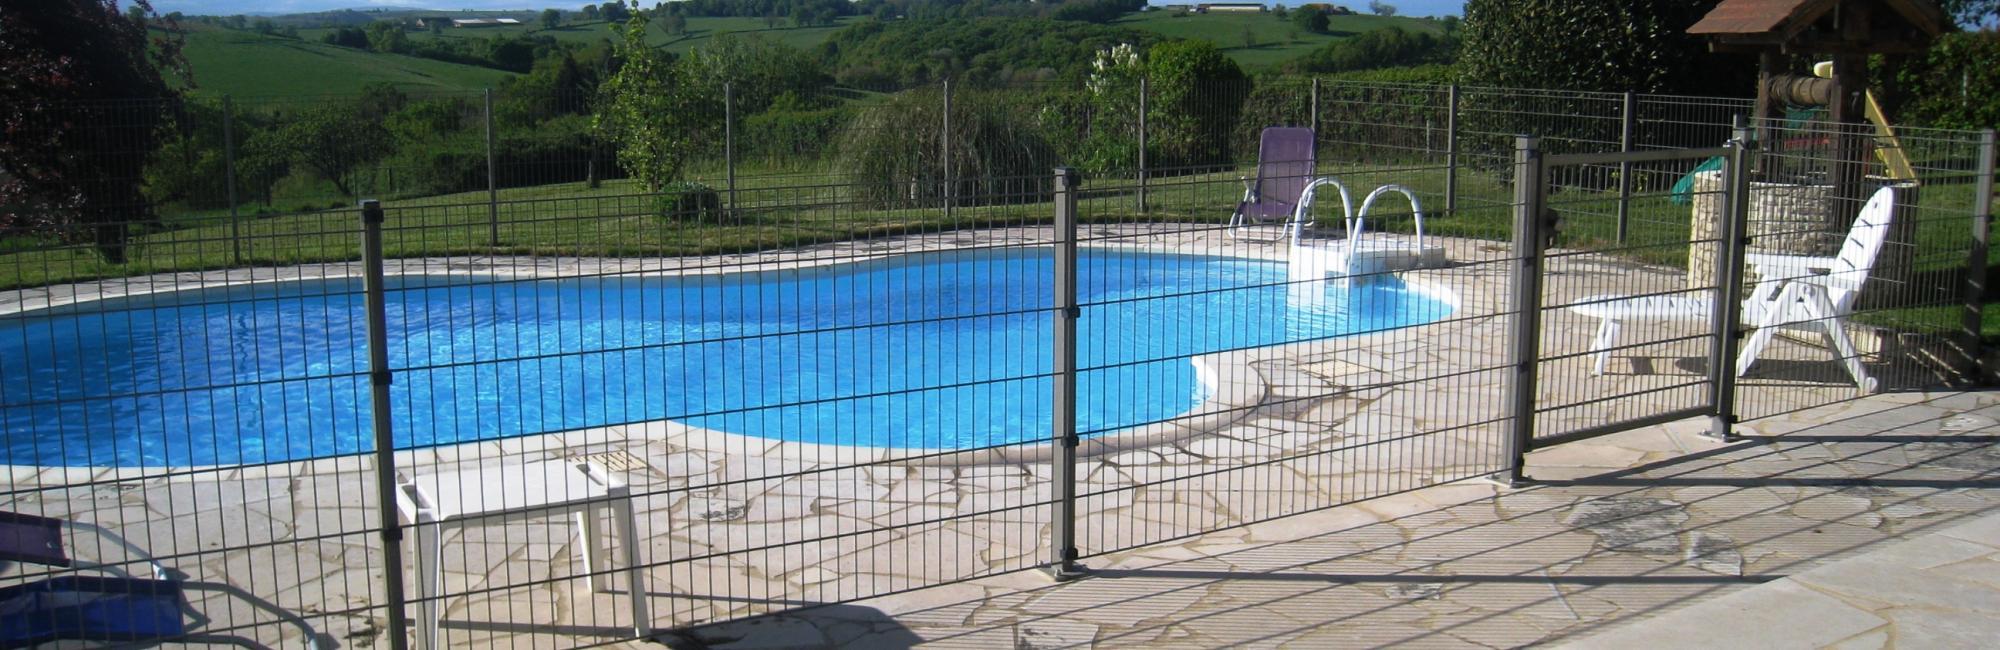 Auvergne vakantiehuis zwembad